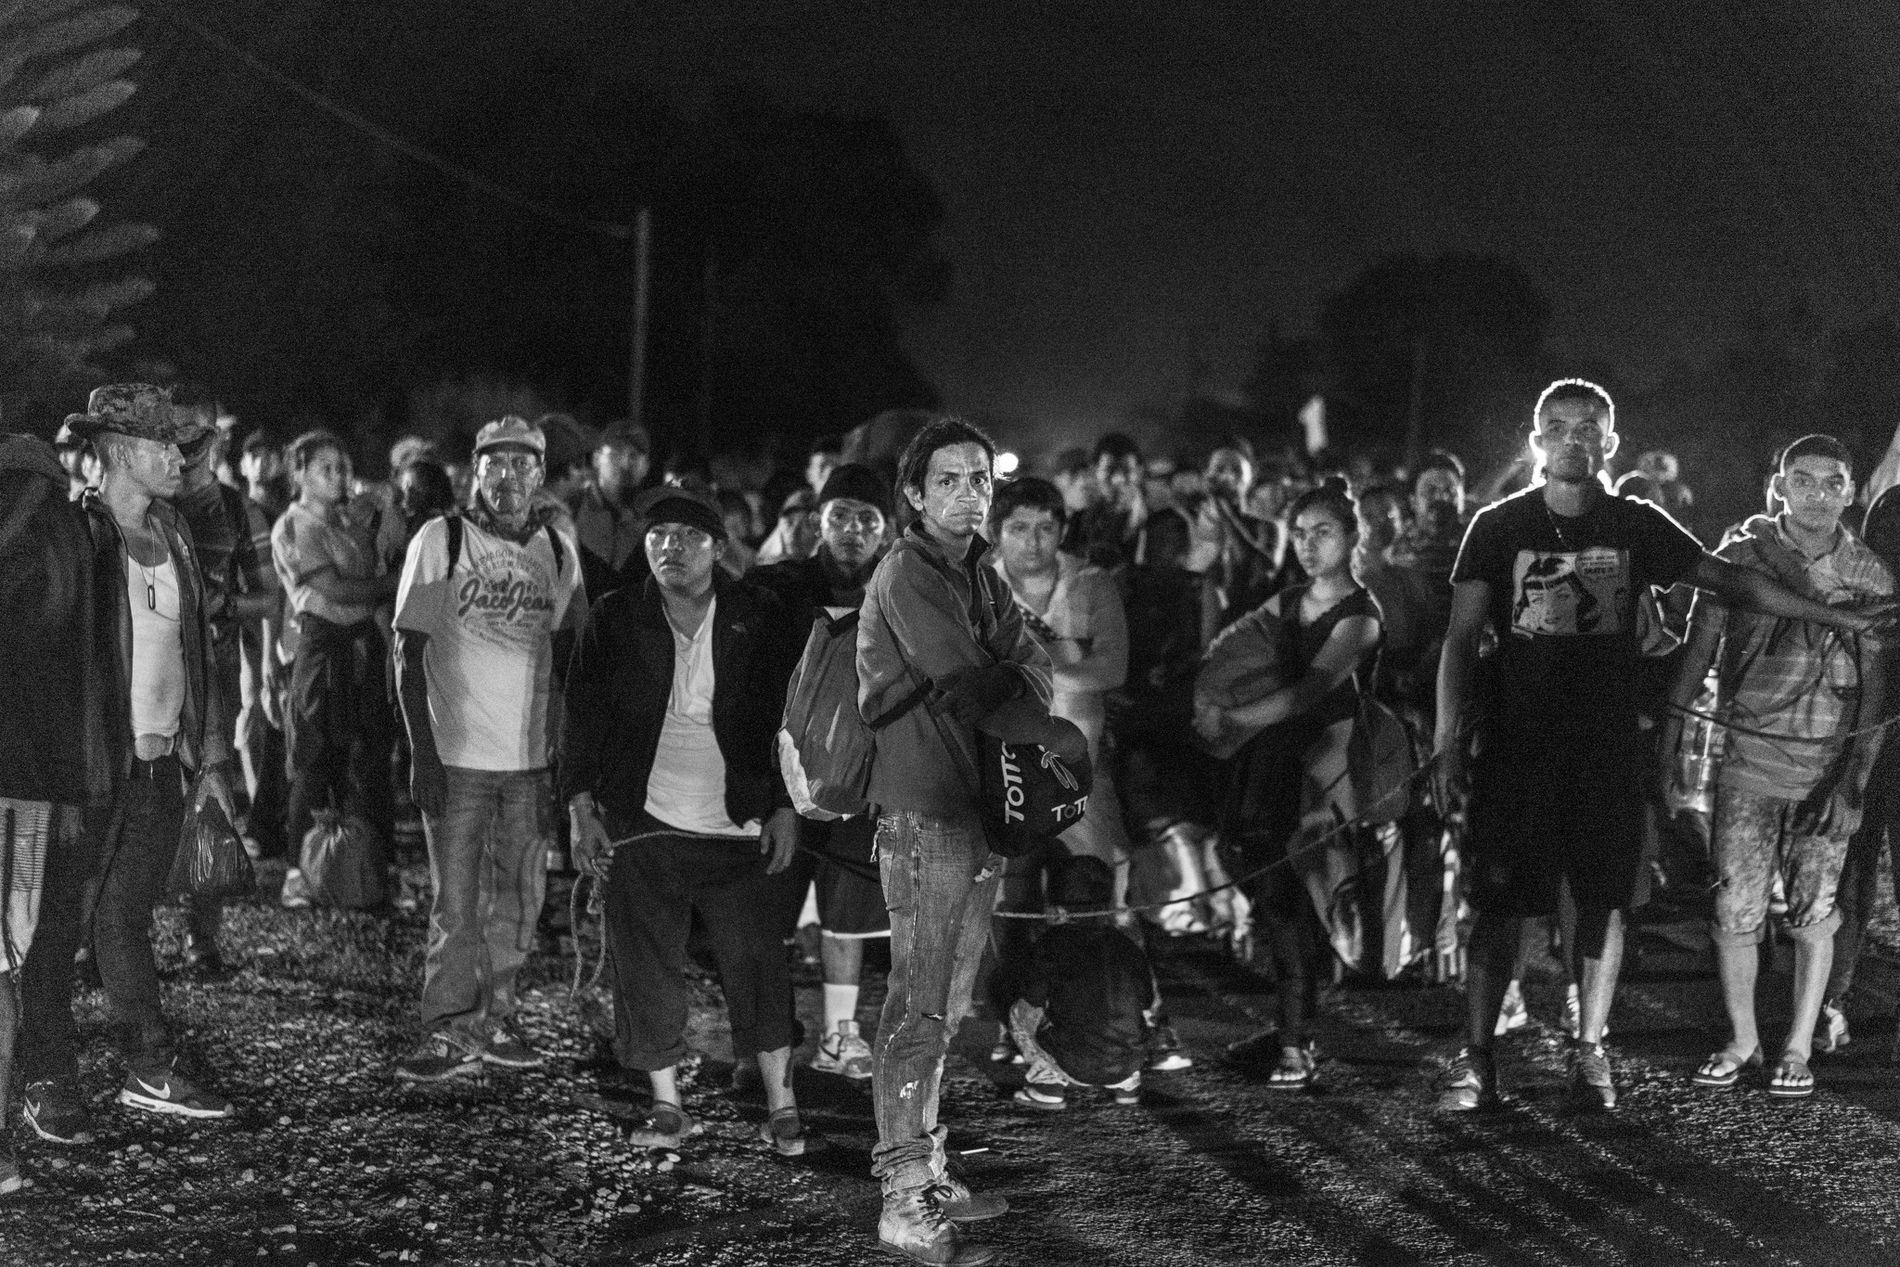 Tapachula, México. 4 de noviembre de 2018. Una caravana compuesta principalmente por migrantes salvadoreños descansa durante su caminata de cinco horas de Metapa a Tapachula.